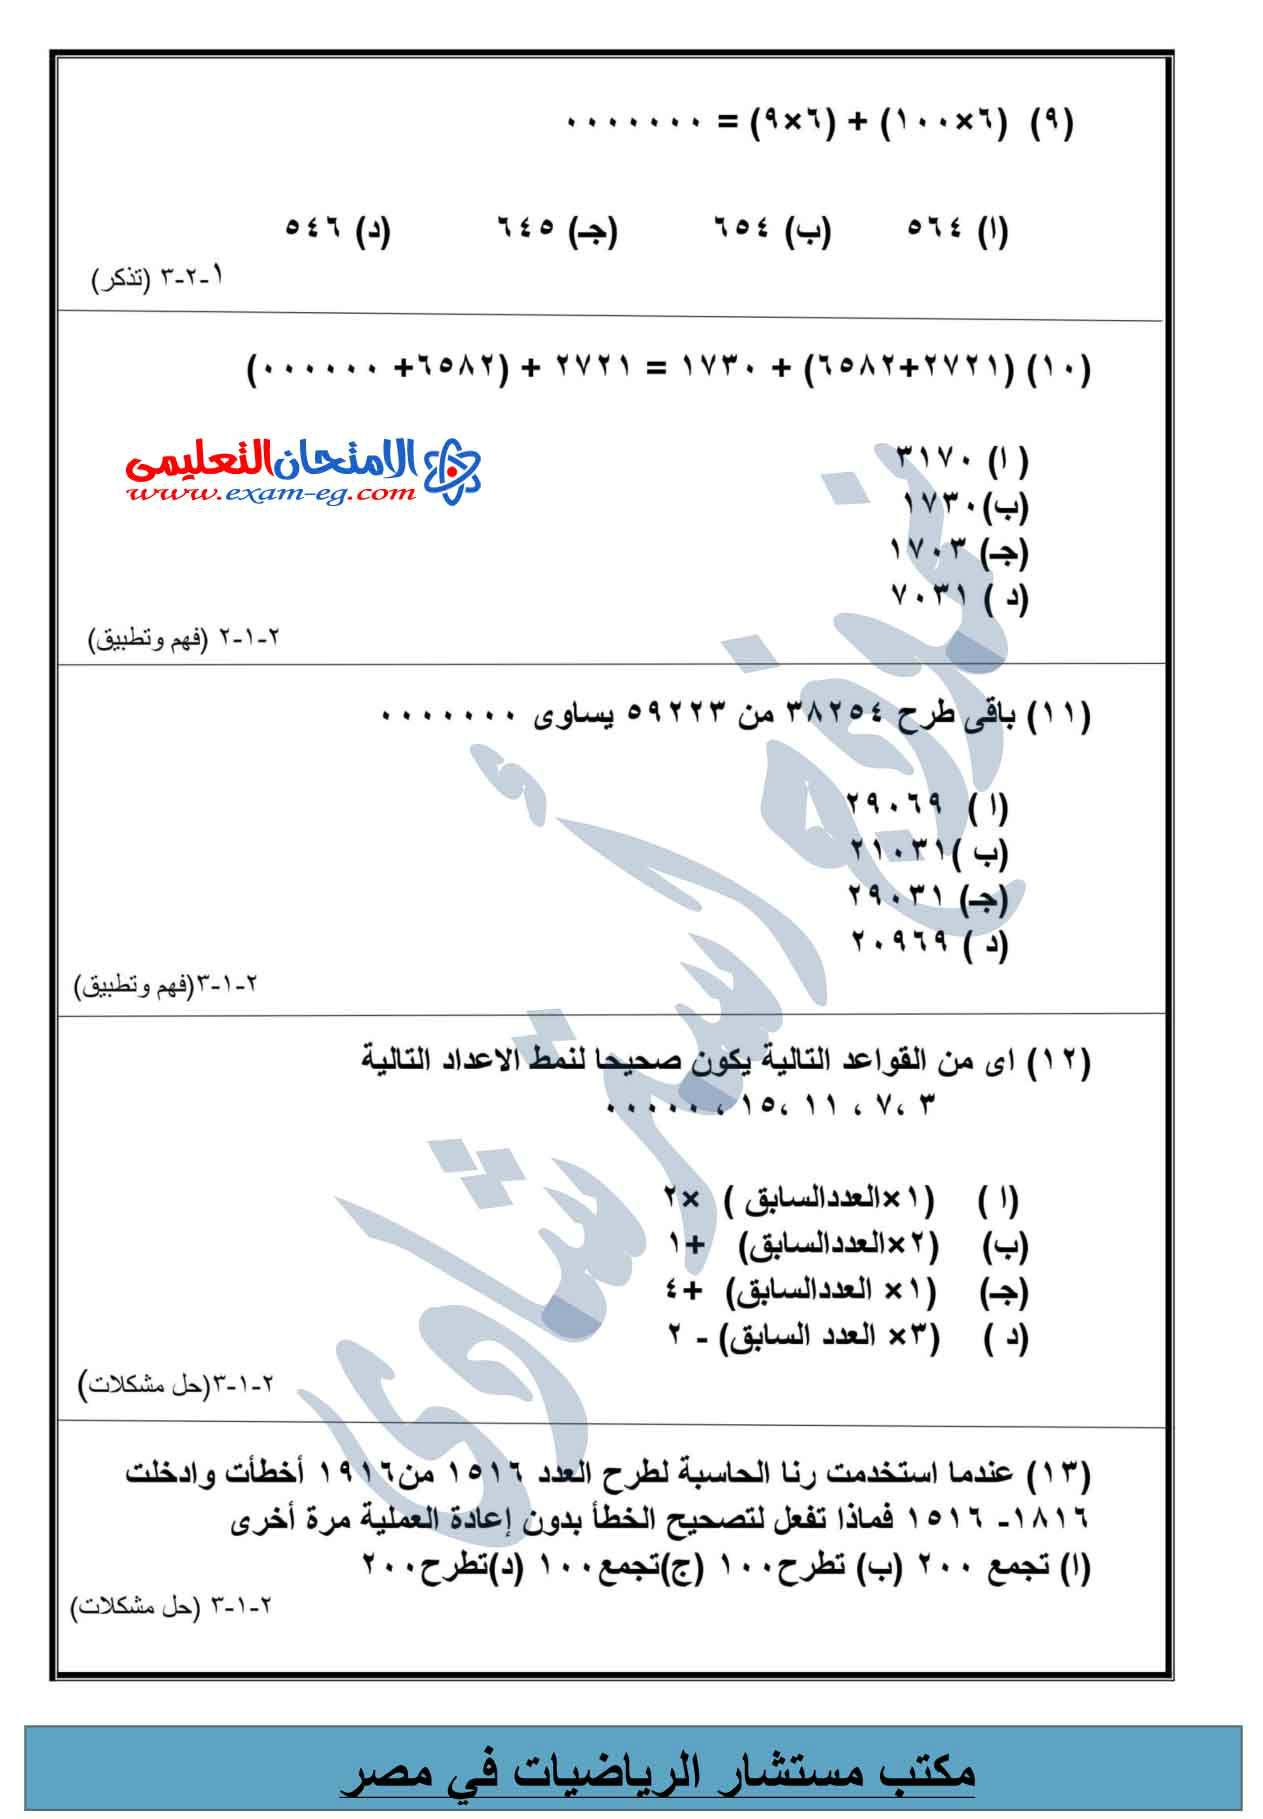 exam-eg.com_14492420353617.jpg